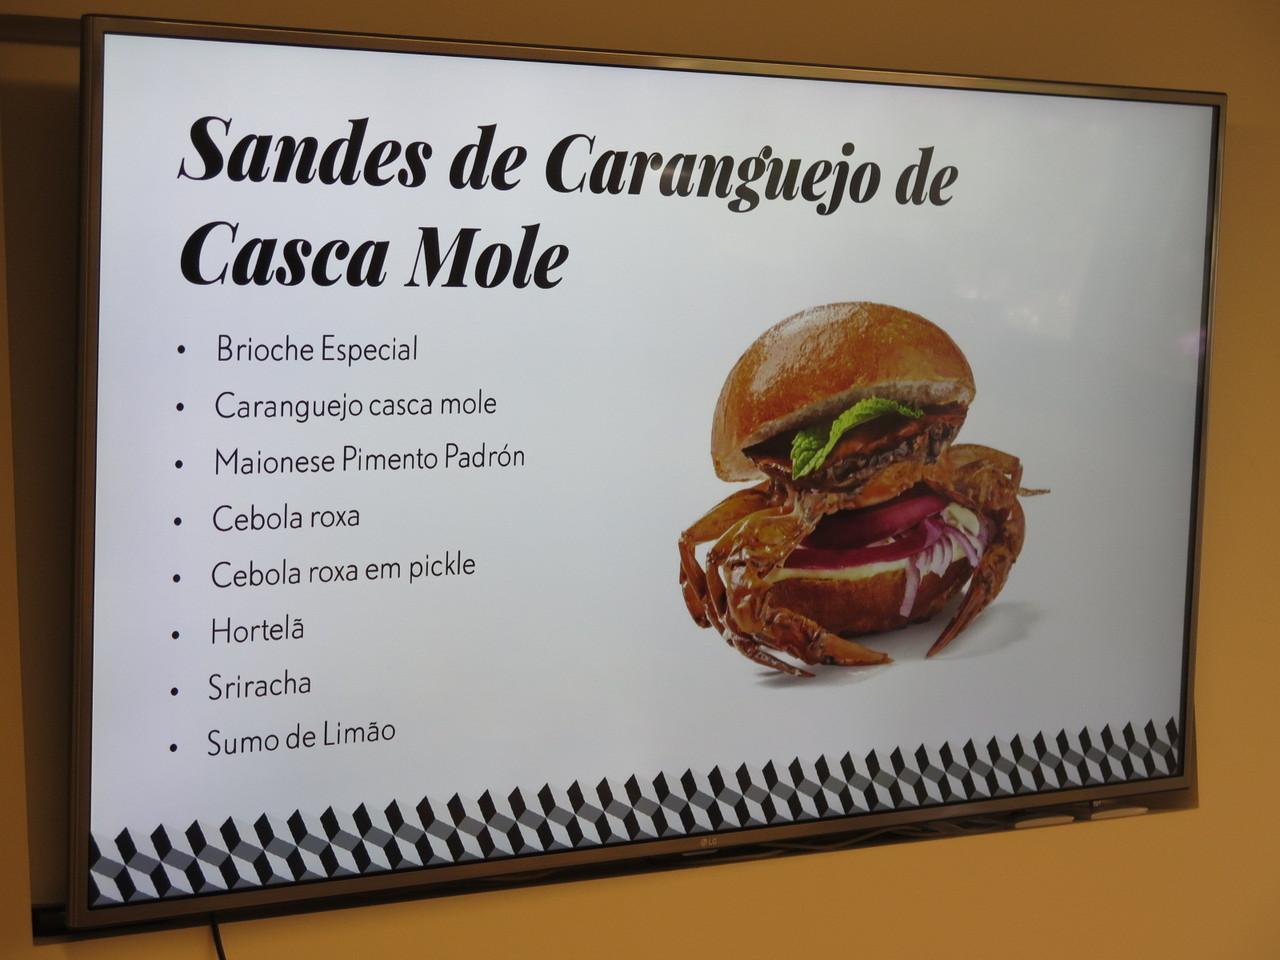 Sandes de Caranguejo de Casca Mole